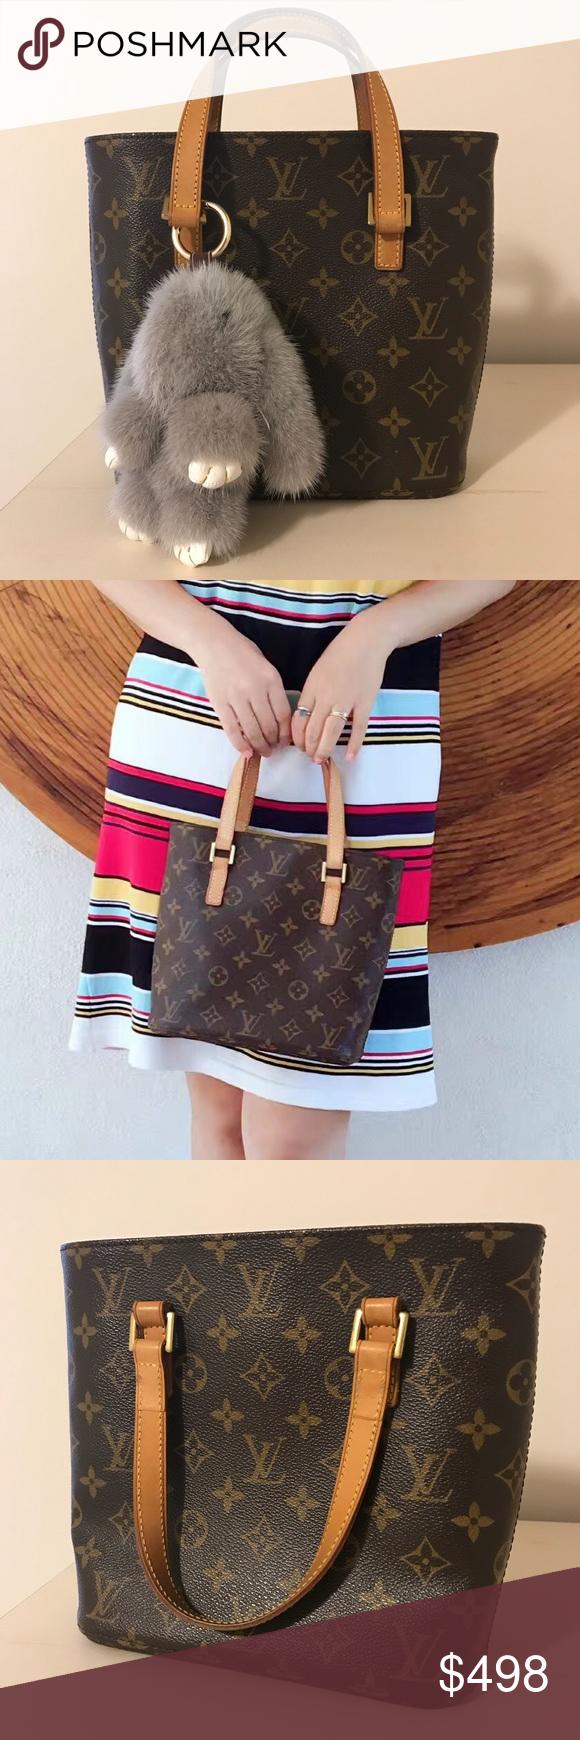 f9808171de7a Louis Vuitton vavin pm monogram handbag small tote Bunny Key chain❌ not  included‼️